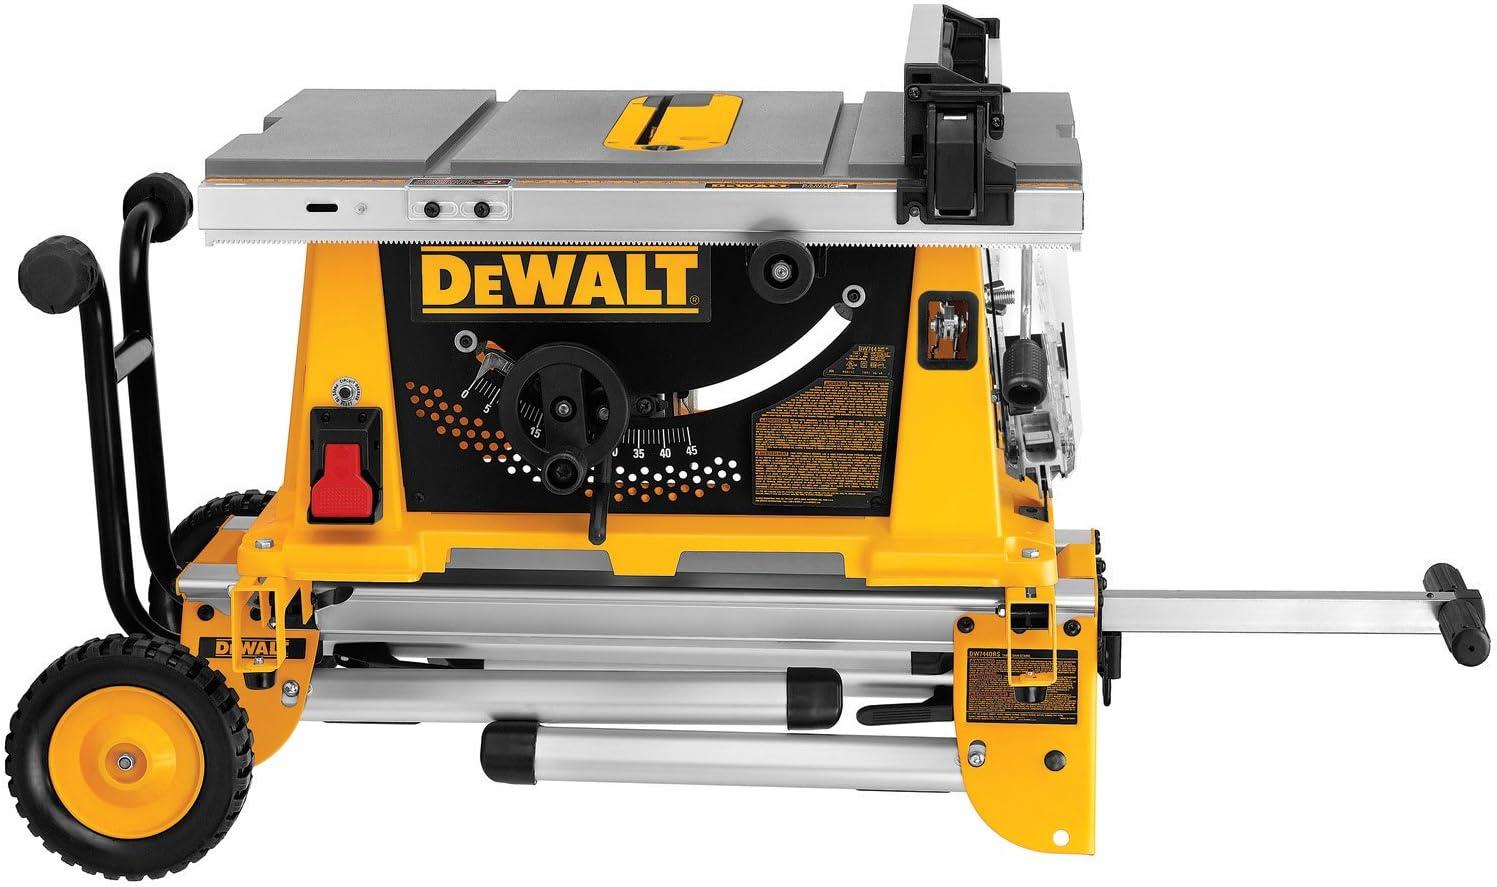 8. The DeWalt DW744XRS Portable Table Saw